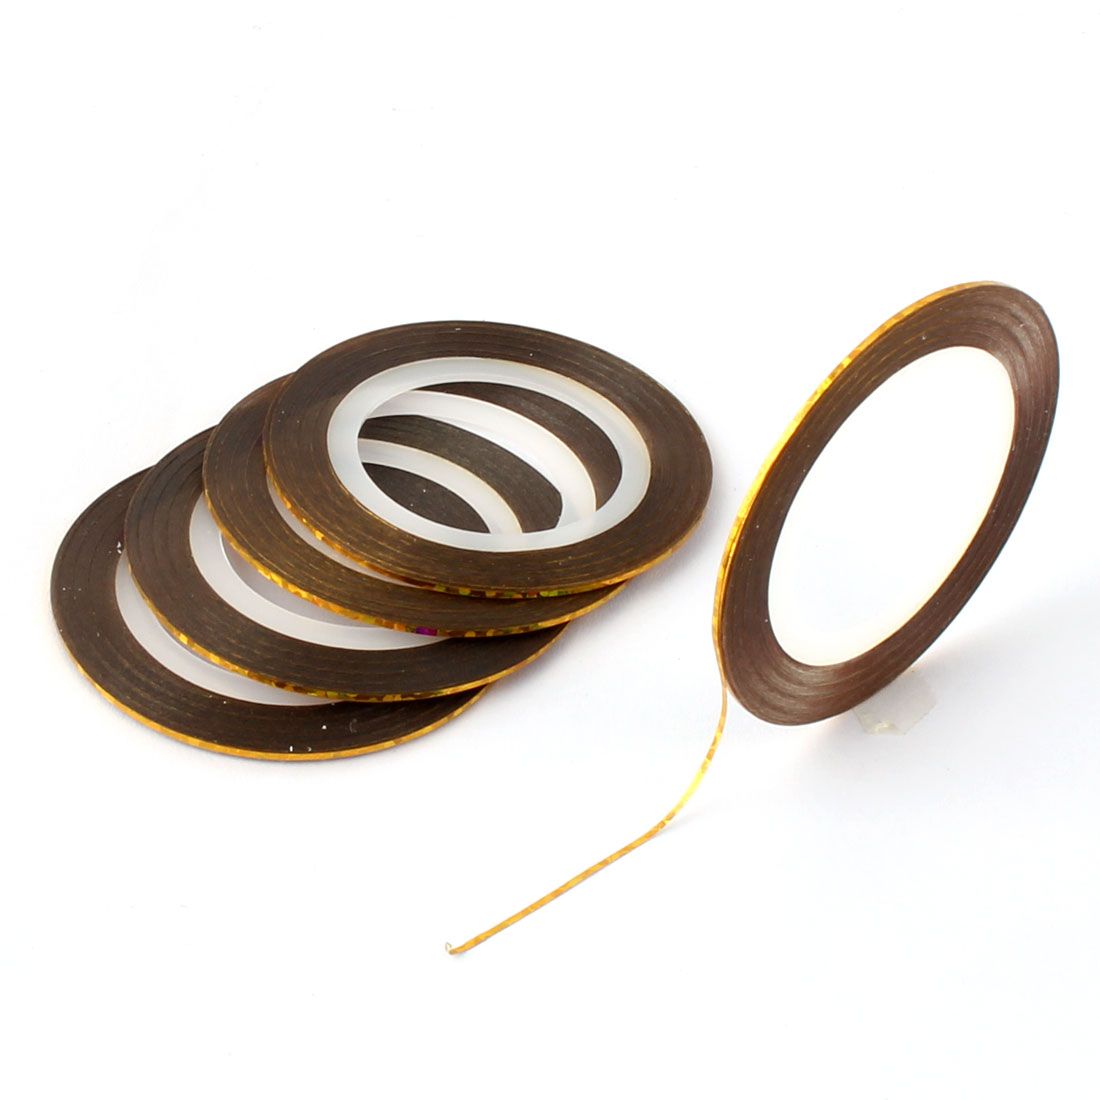 Nail Art DIY Rolls Striping Decoration Sticker Tips Nail Line Tape Gold Tone 5 PCS